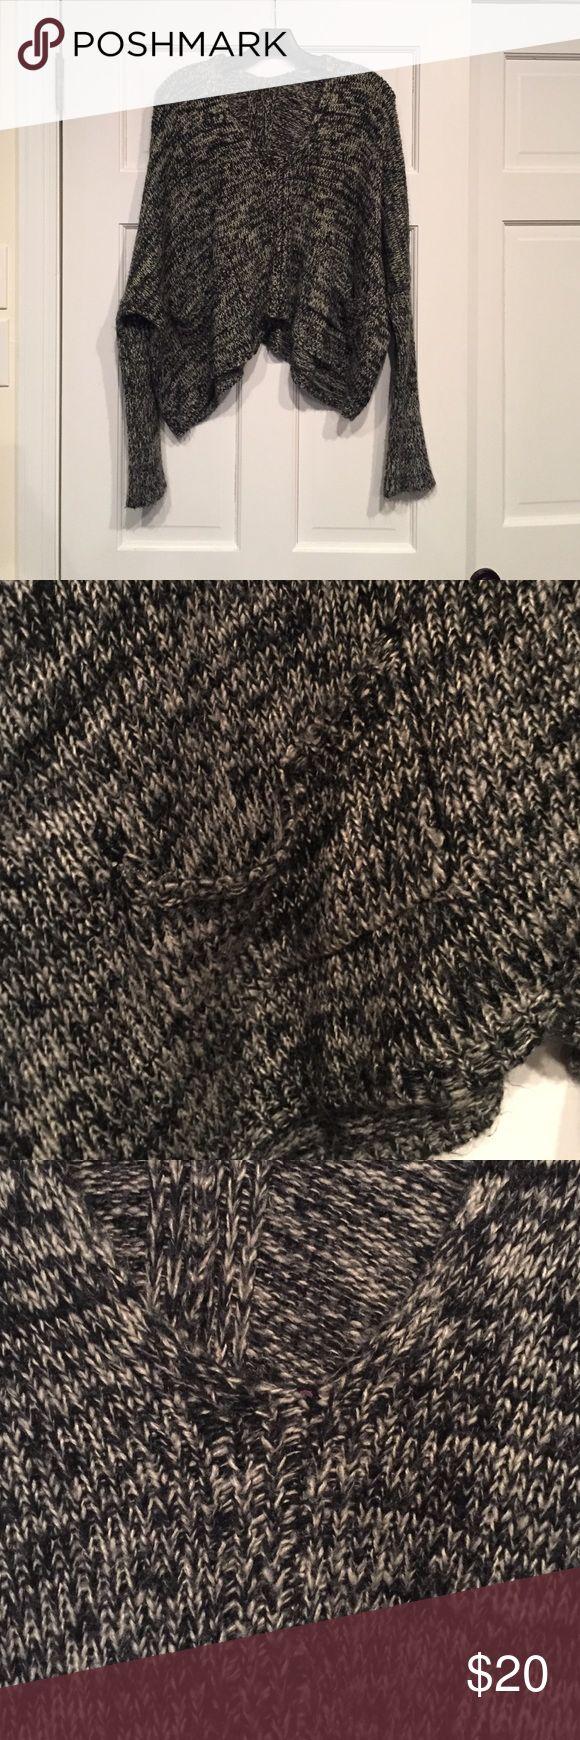 Brandy Melville sweater Brandy Melville sweater Brandy Melville Sweaters V-Necks